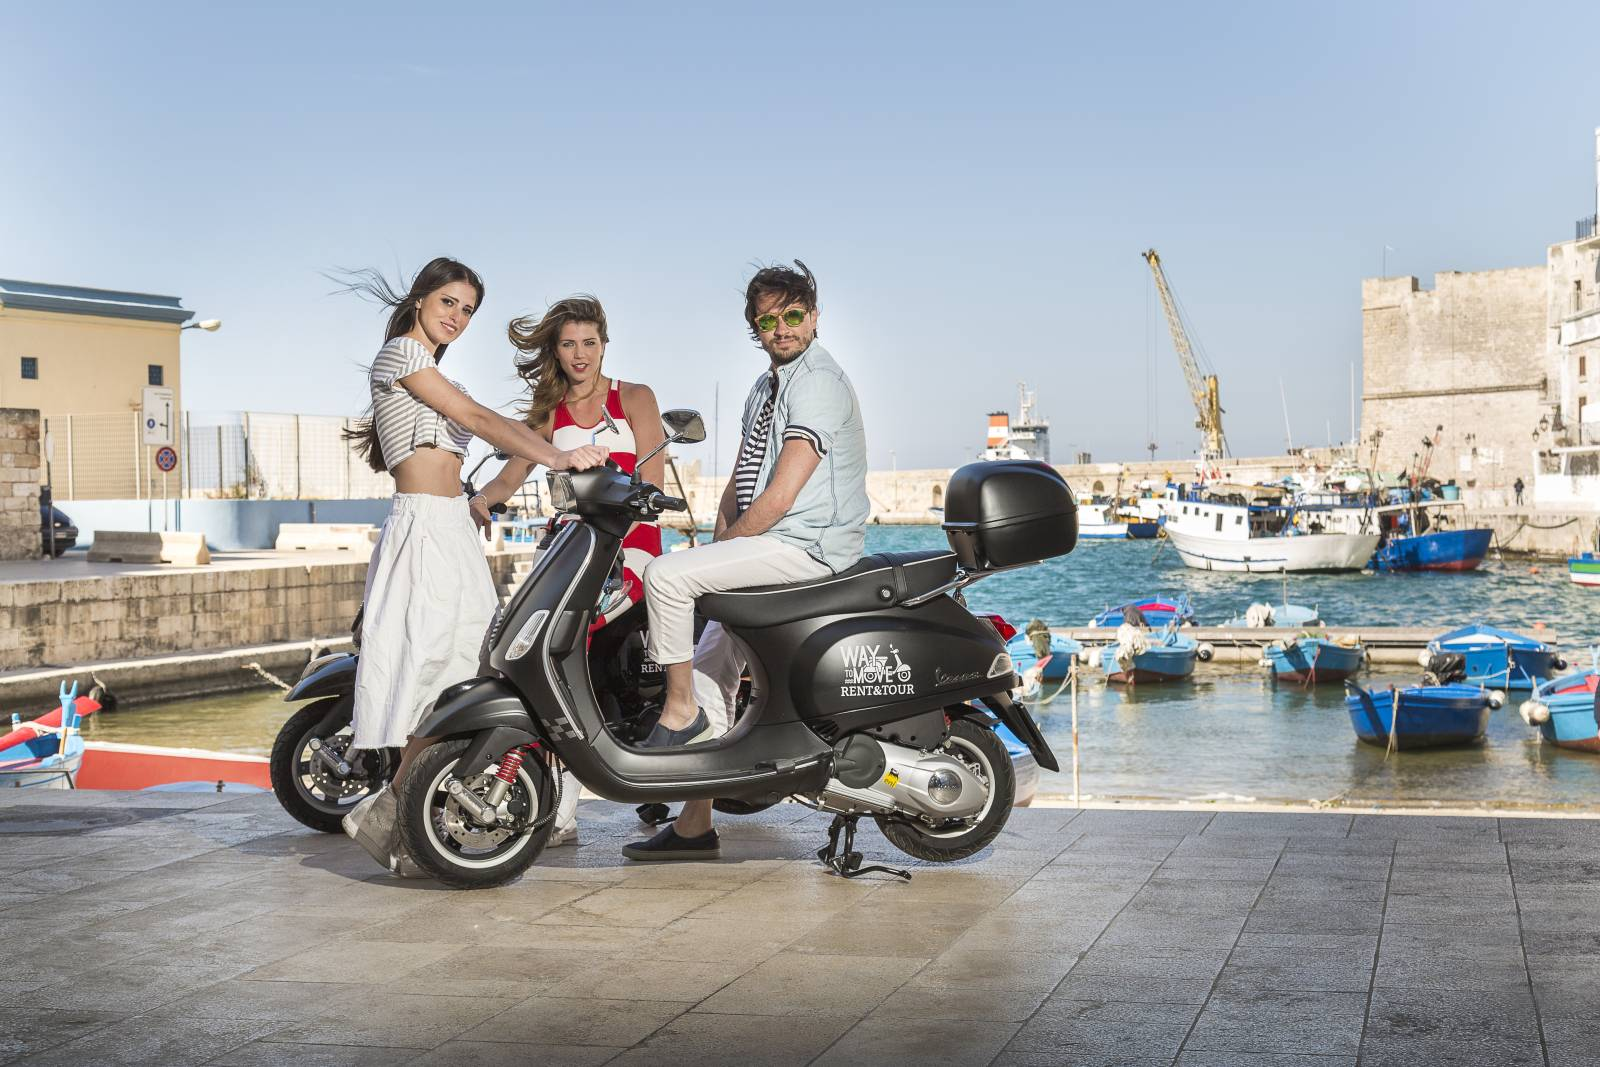 Sito web Turismo Noleggio Veicoli: Way to Move - Maingage, Web Agency Bari